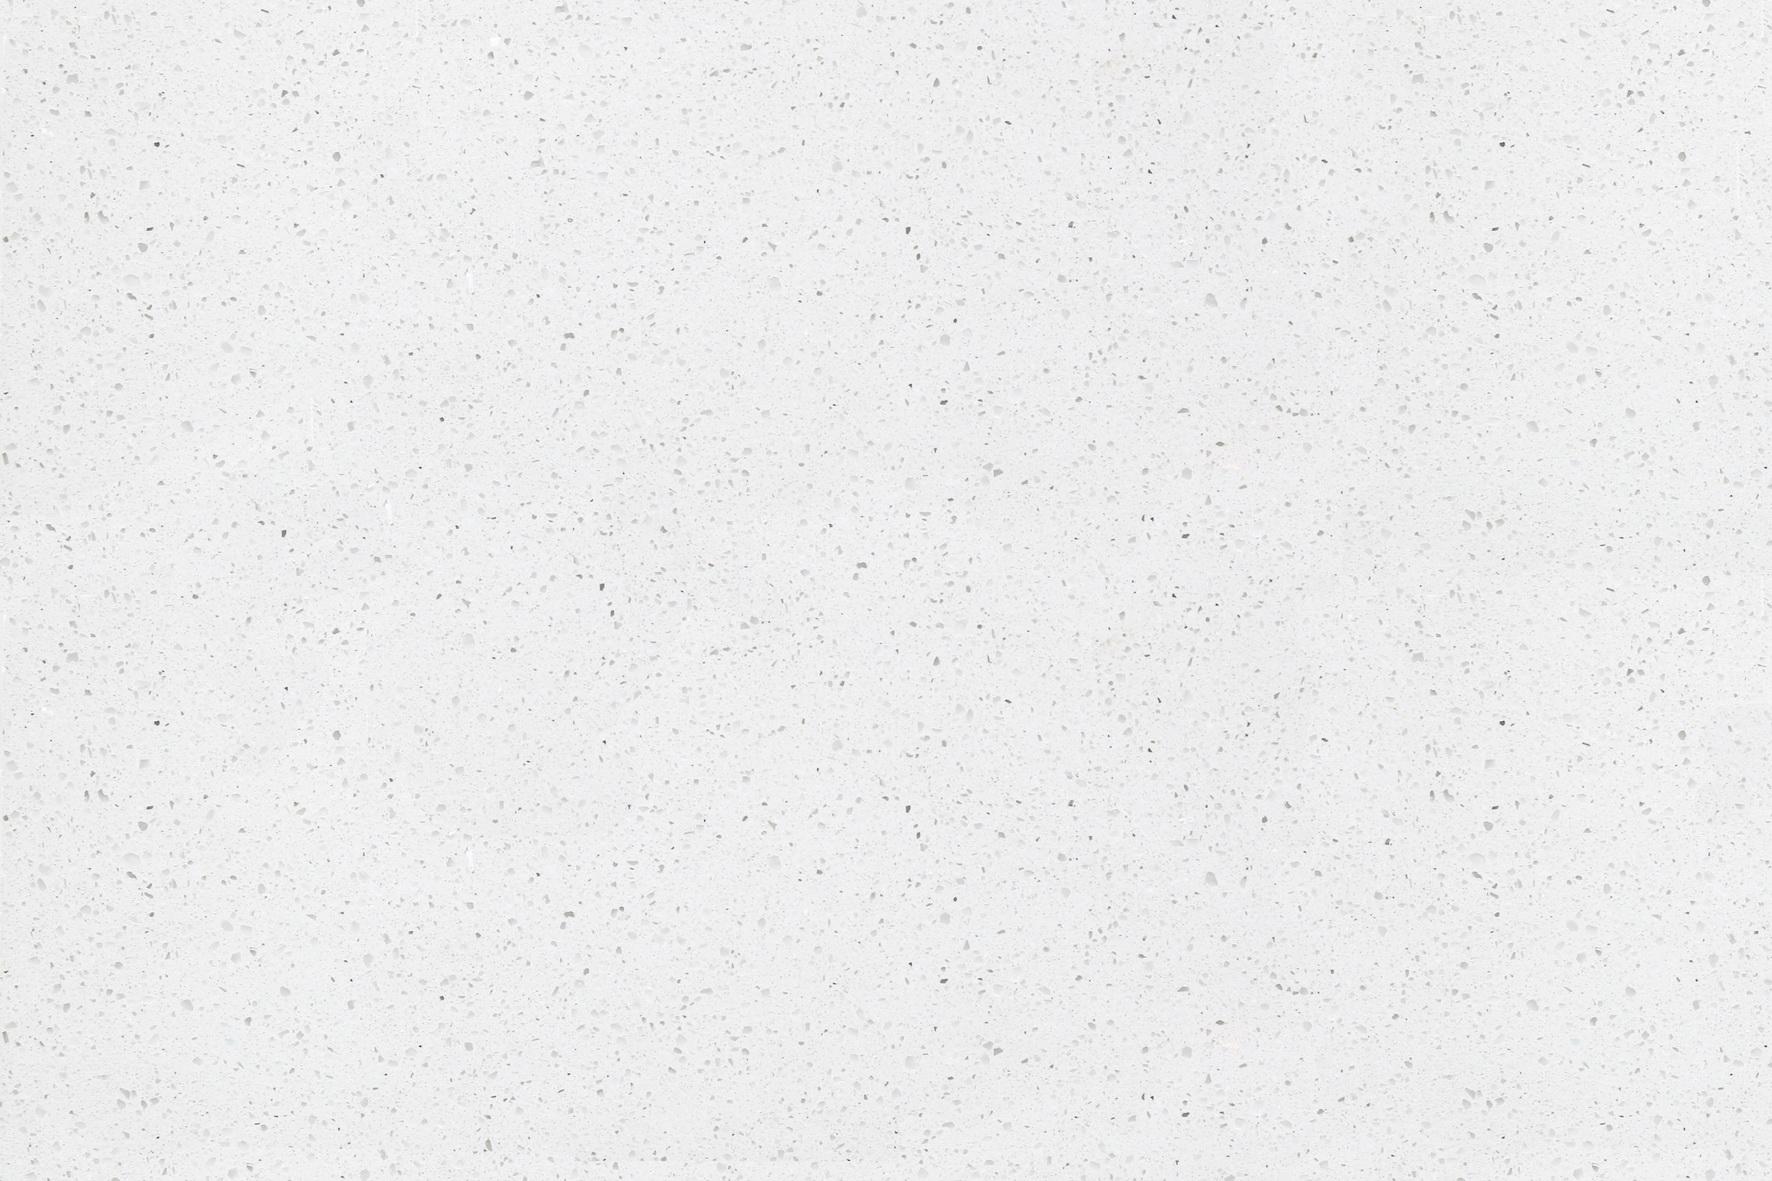 RAINBOW WHITE UNIPLUS UNIPLUS LUCIDE Foto: 1_44604_37636.jpg